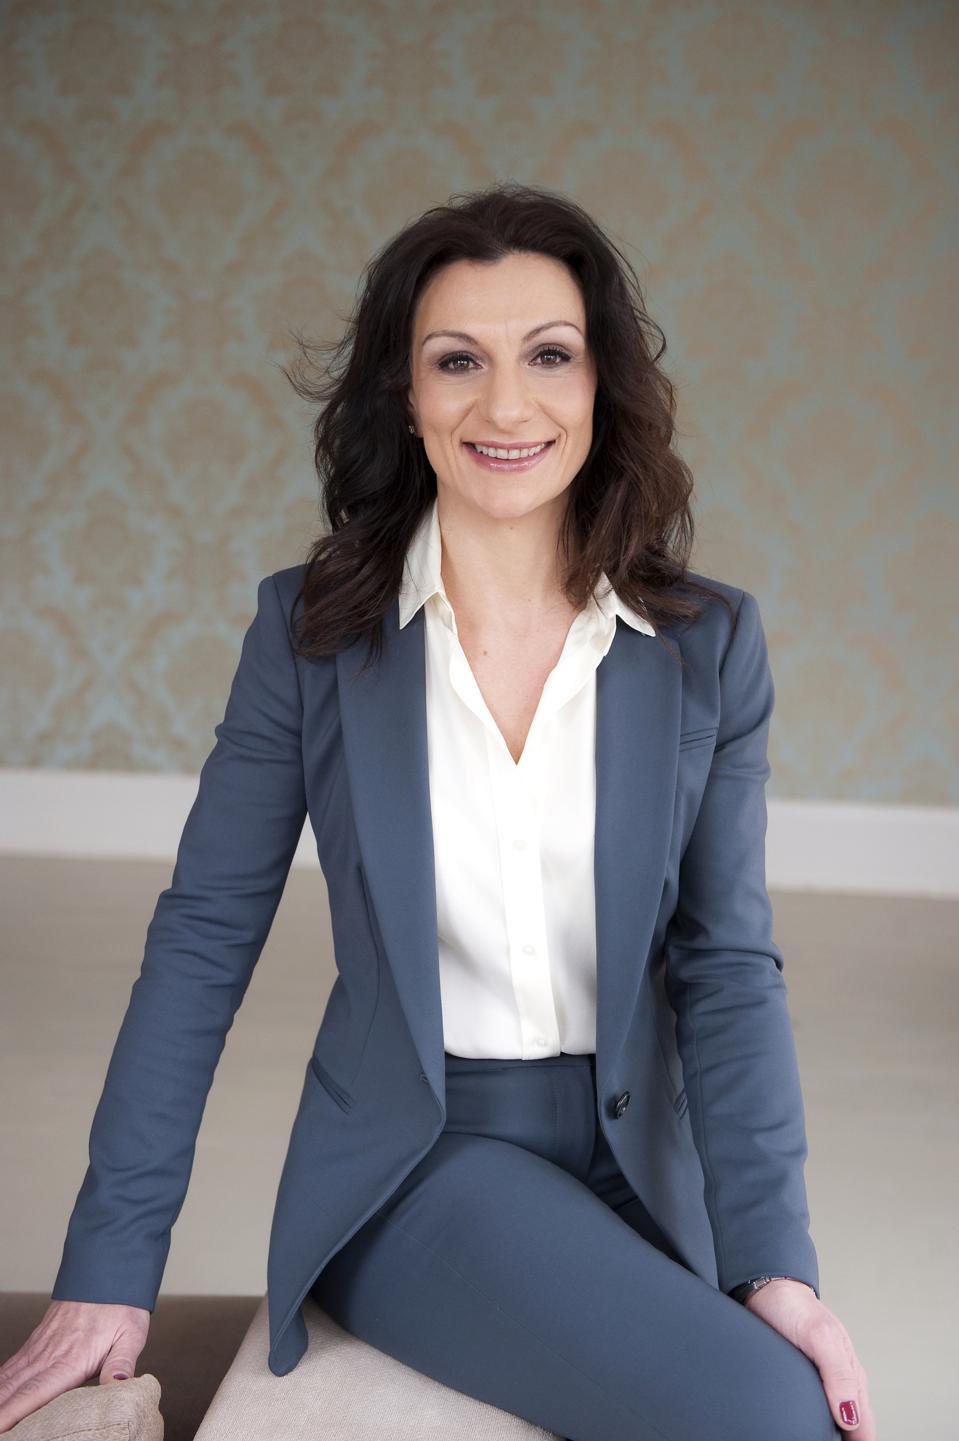 Lucia Langella, partner at St James's Place Wealth Management